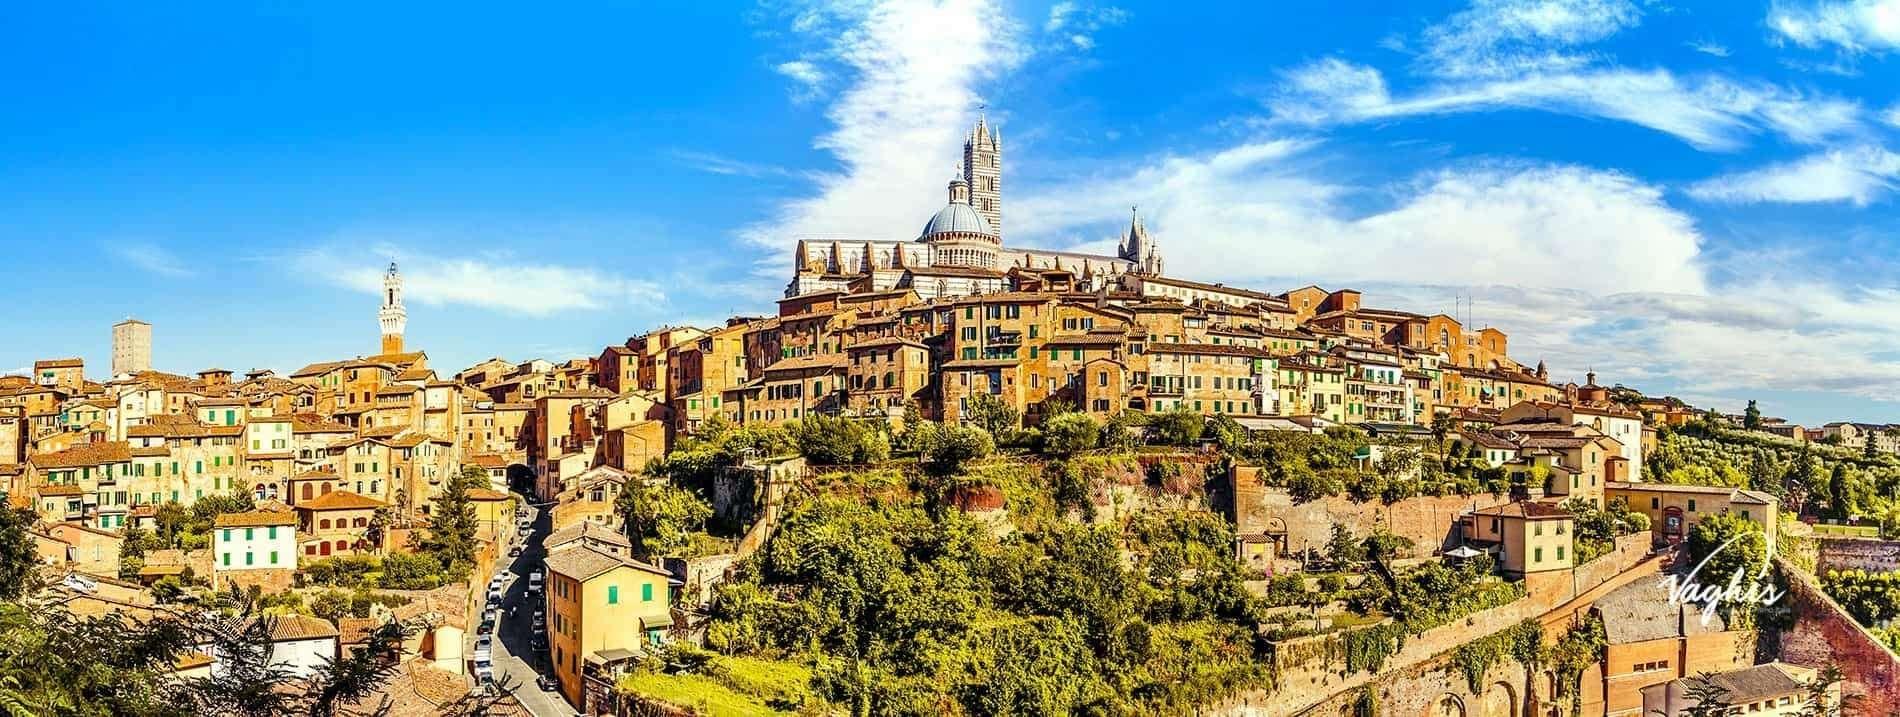 Siena - © Vaghis - viaggi & turismo Italia - Tutti-i-diritti riservati